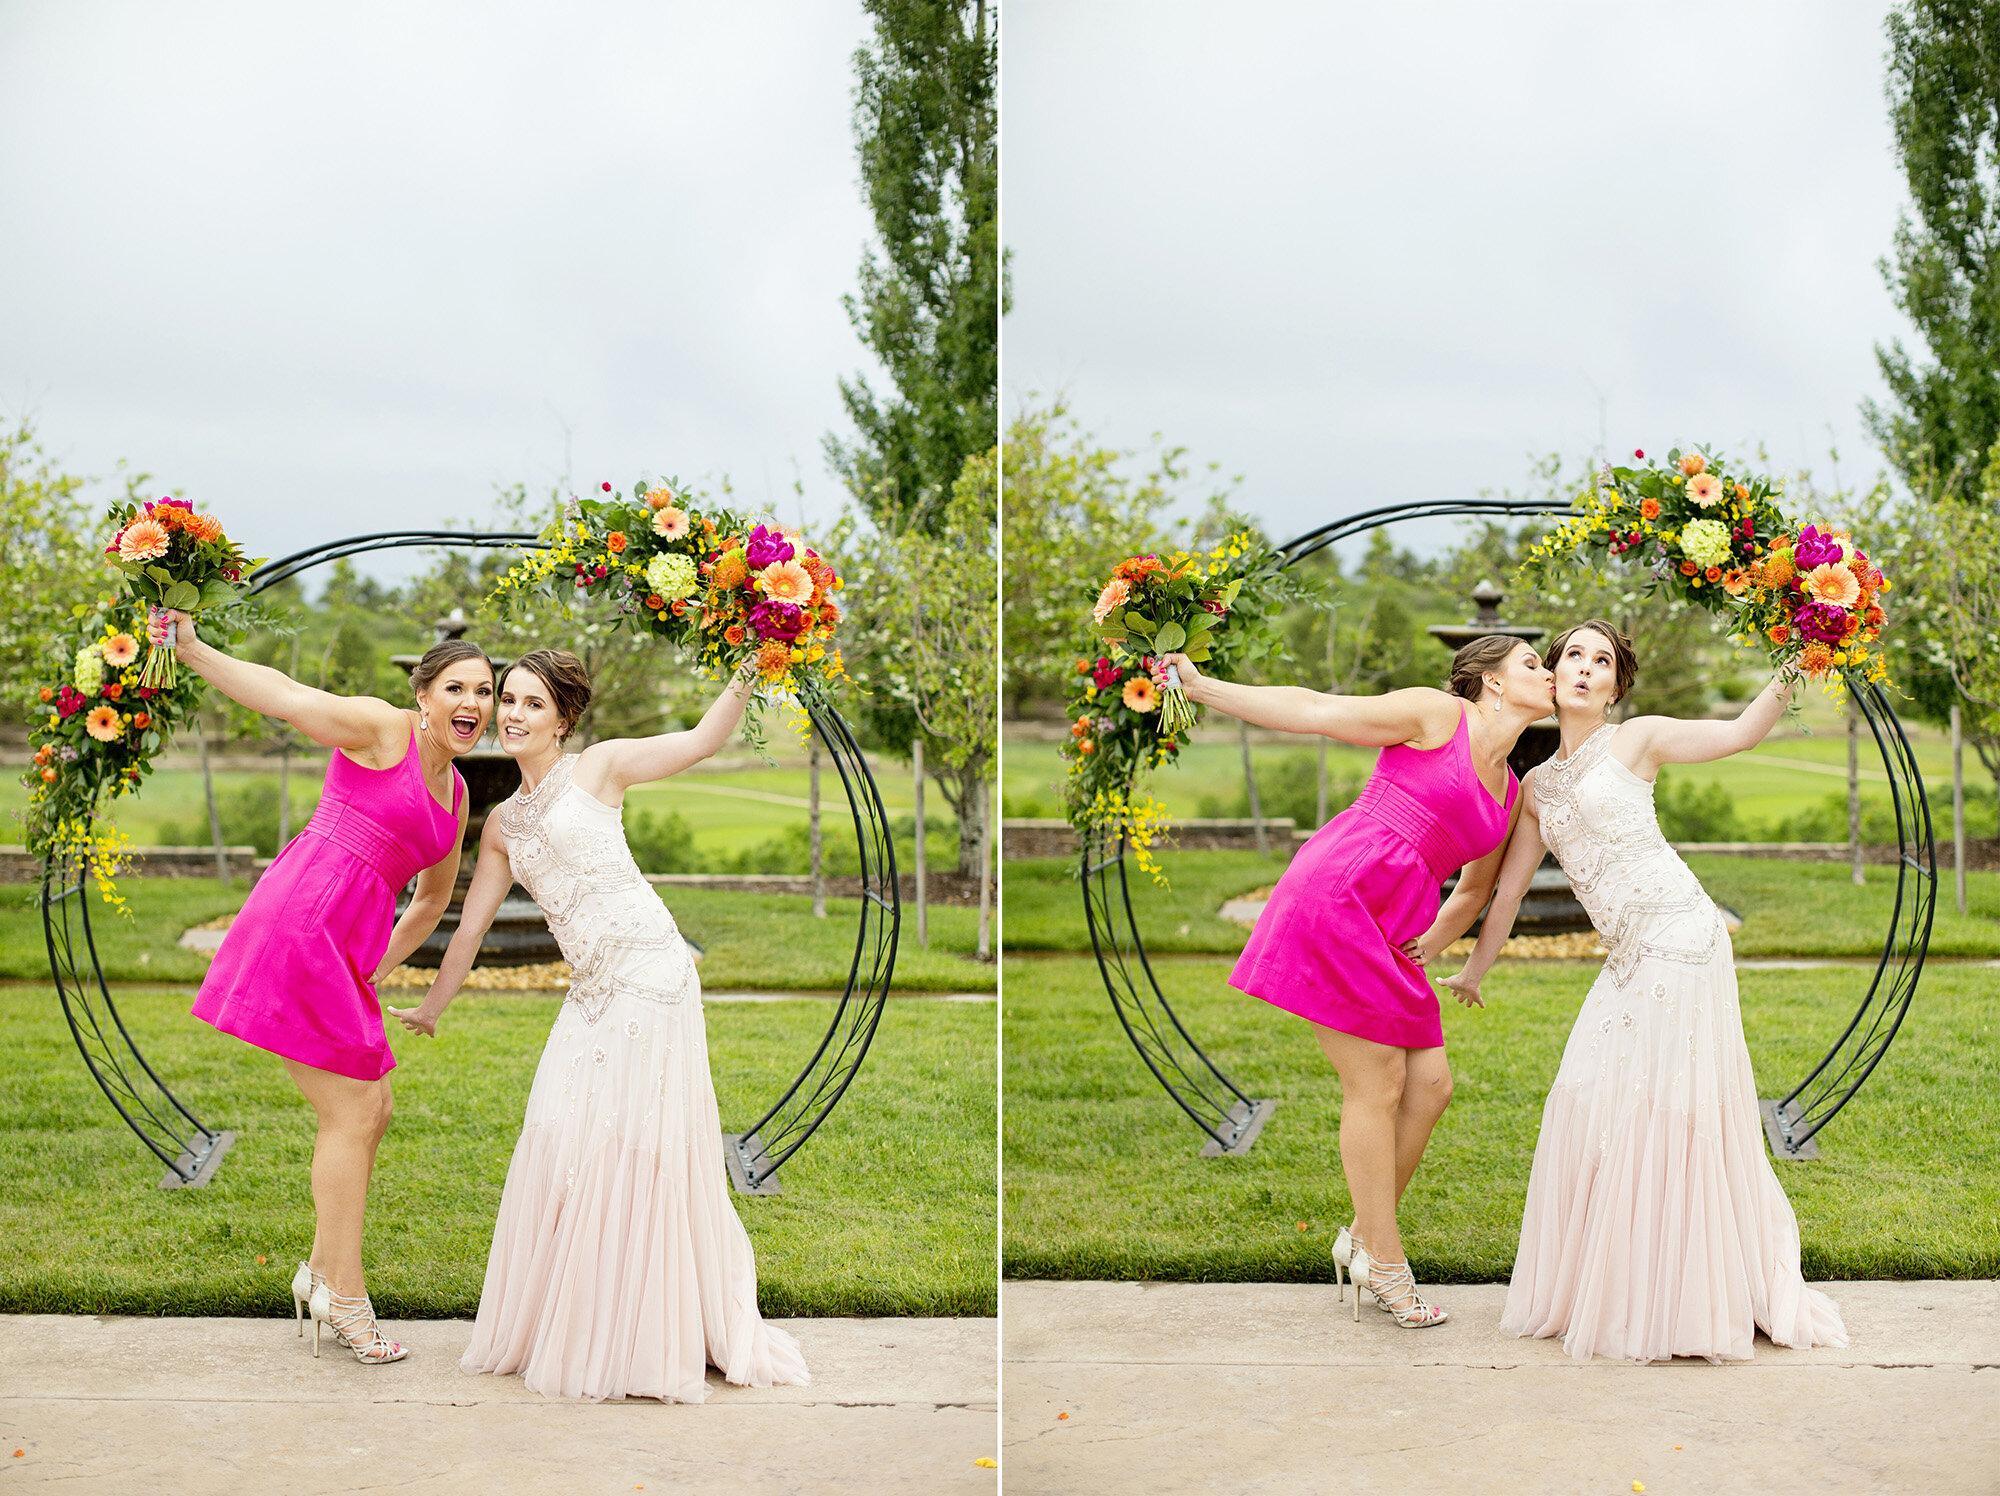 Seriously_Sabrina_Photography_Colorado_Springs_Club_at_Flying_Horse_Destination_Wedding_ODwyer66.jpg